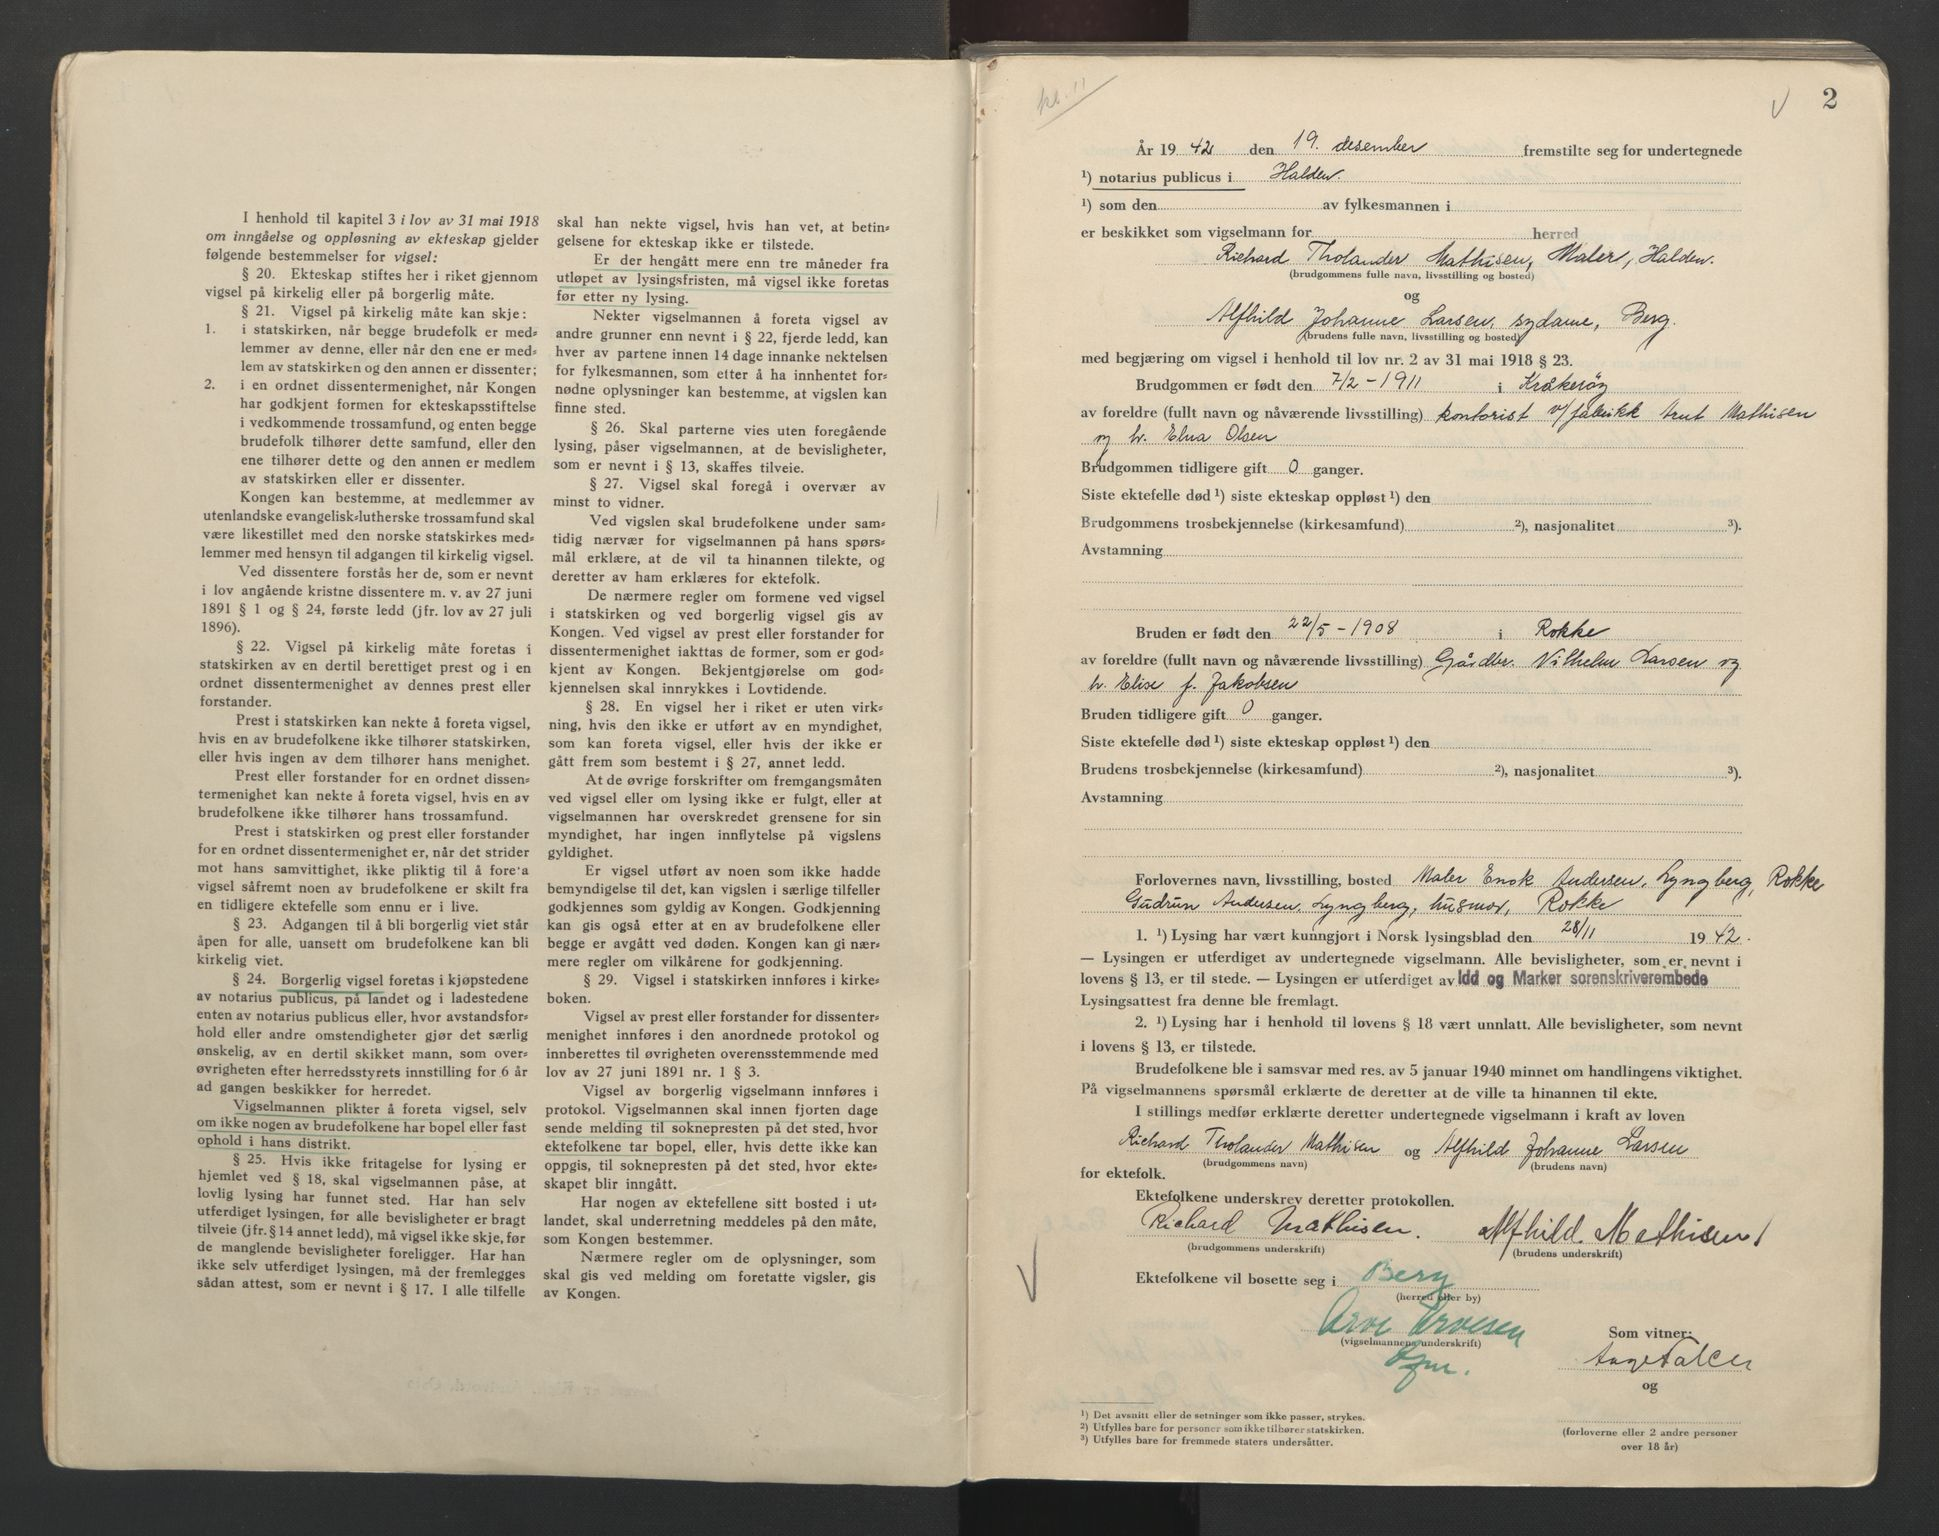 SAO, Idd og Marker sorenskriveri, L/Lc/L0001: Vigselsbøker, 1942-1944, s. 2